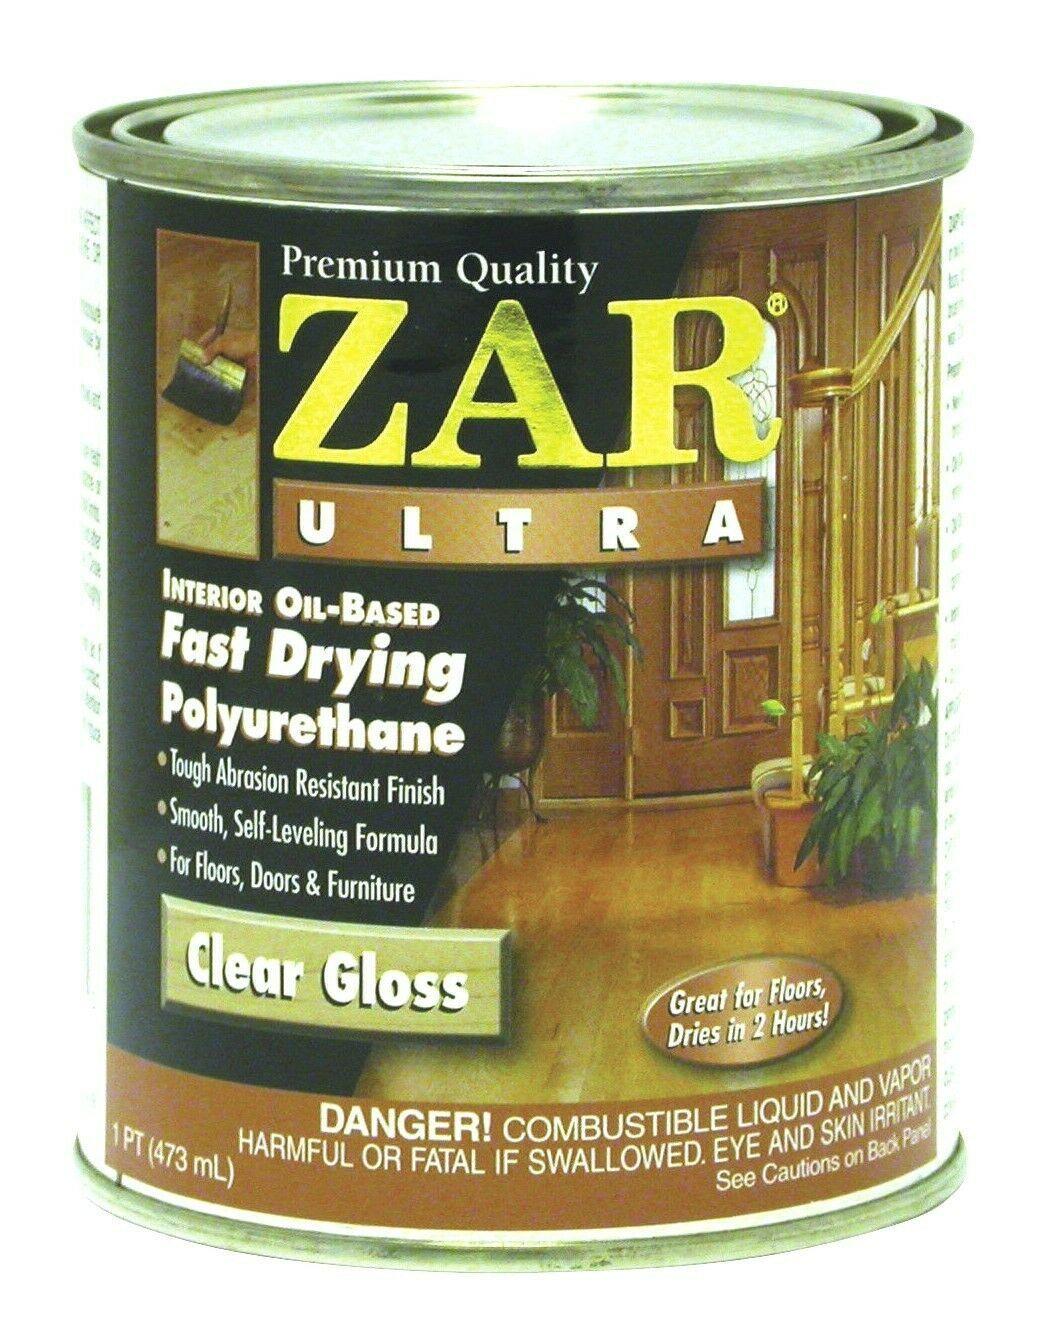 2x Zar Ultra 1Pt Clear Gloss Oil Based Polyurethane 32811 United Gilsonite Lab